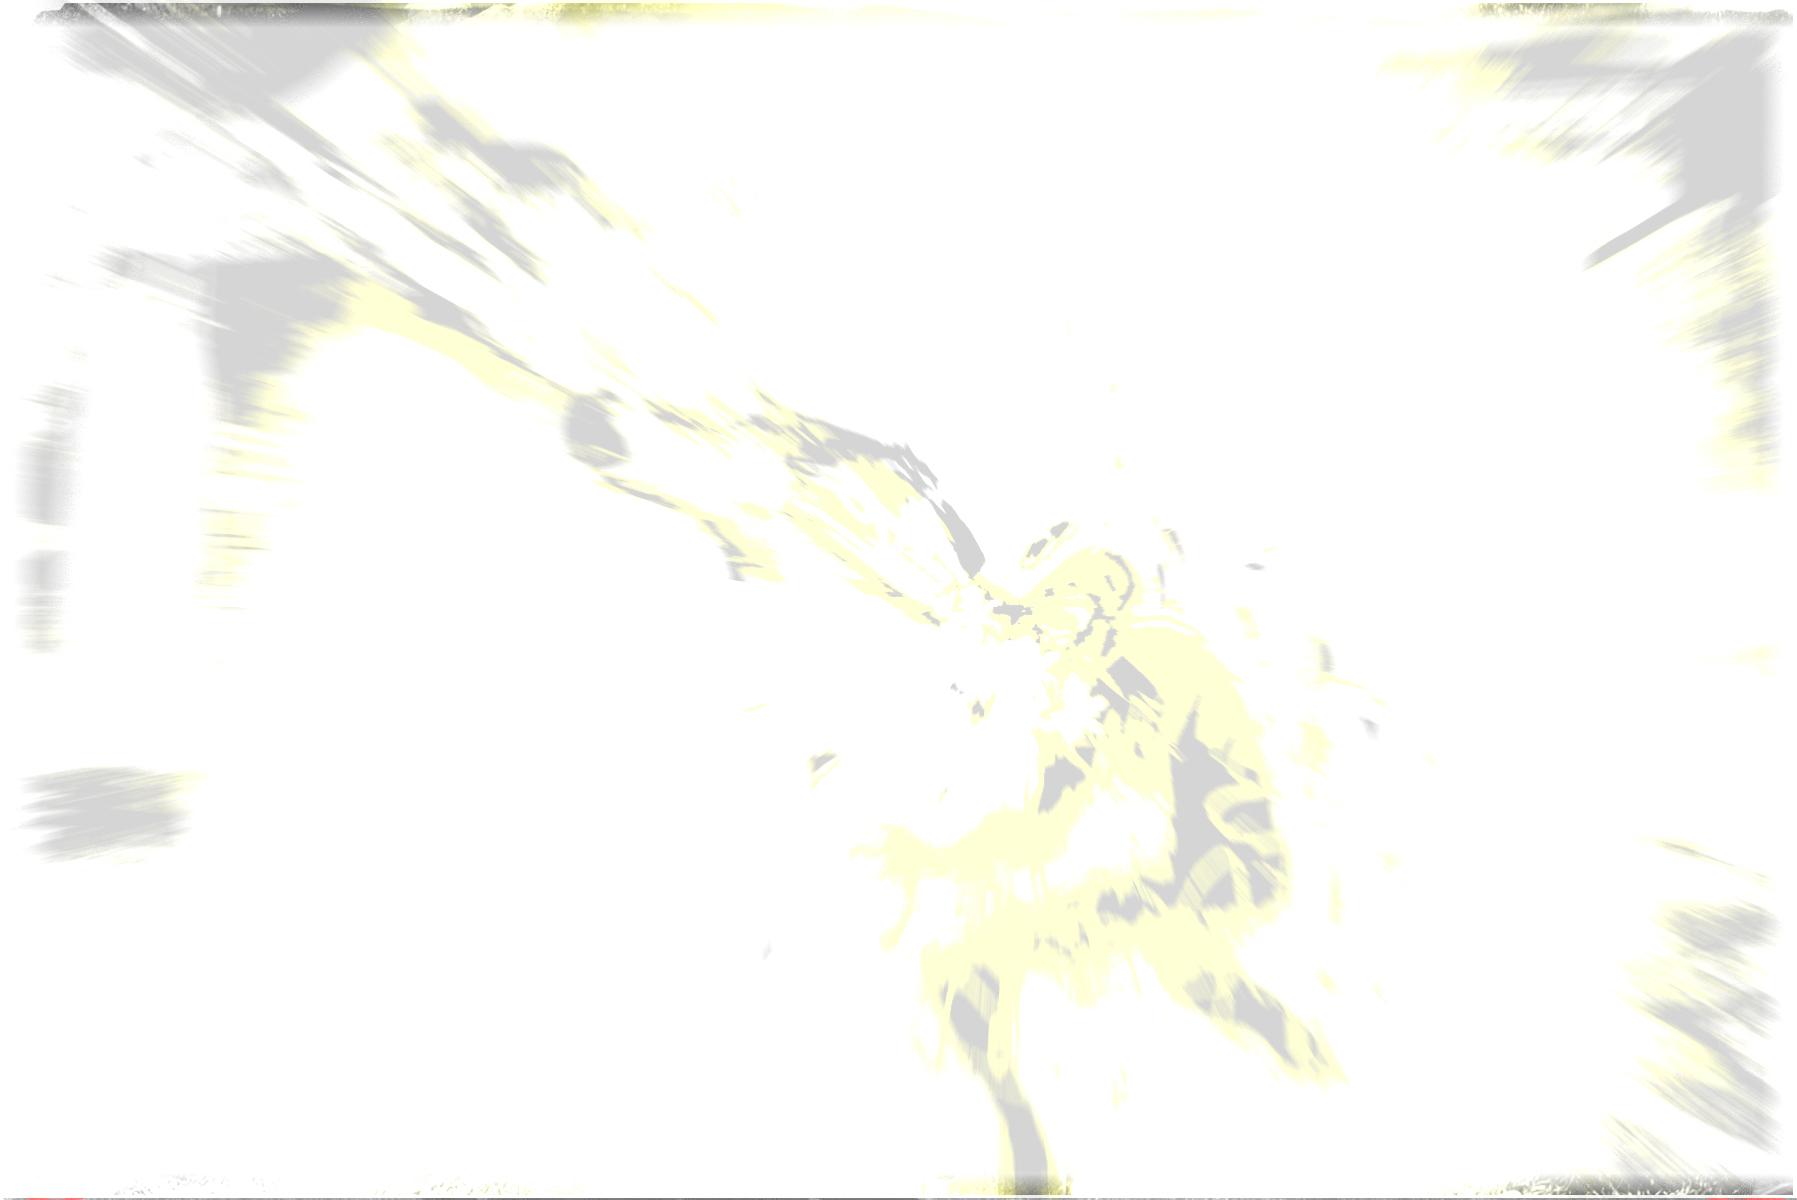 sc05_08b.jpg